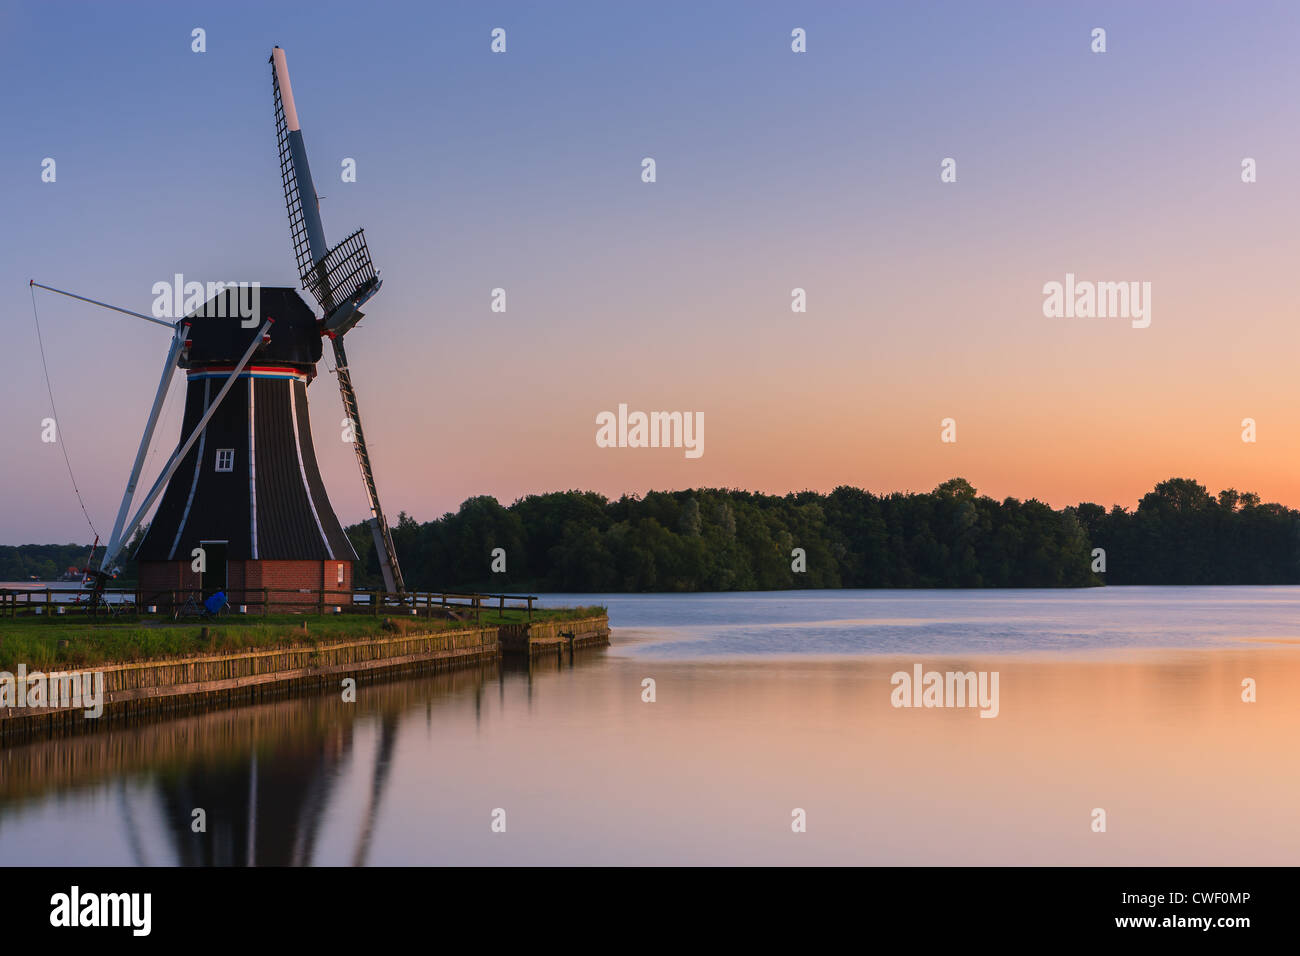 Windmill De Helper at Paterswoldsemeer just after sunset, near Haren in the Province of Groningen, Netherlands - Stock Image